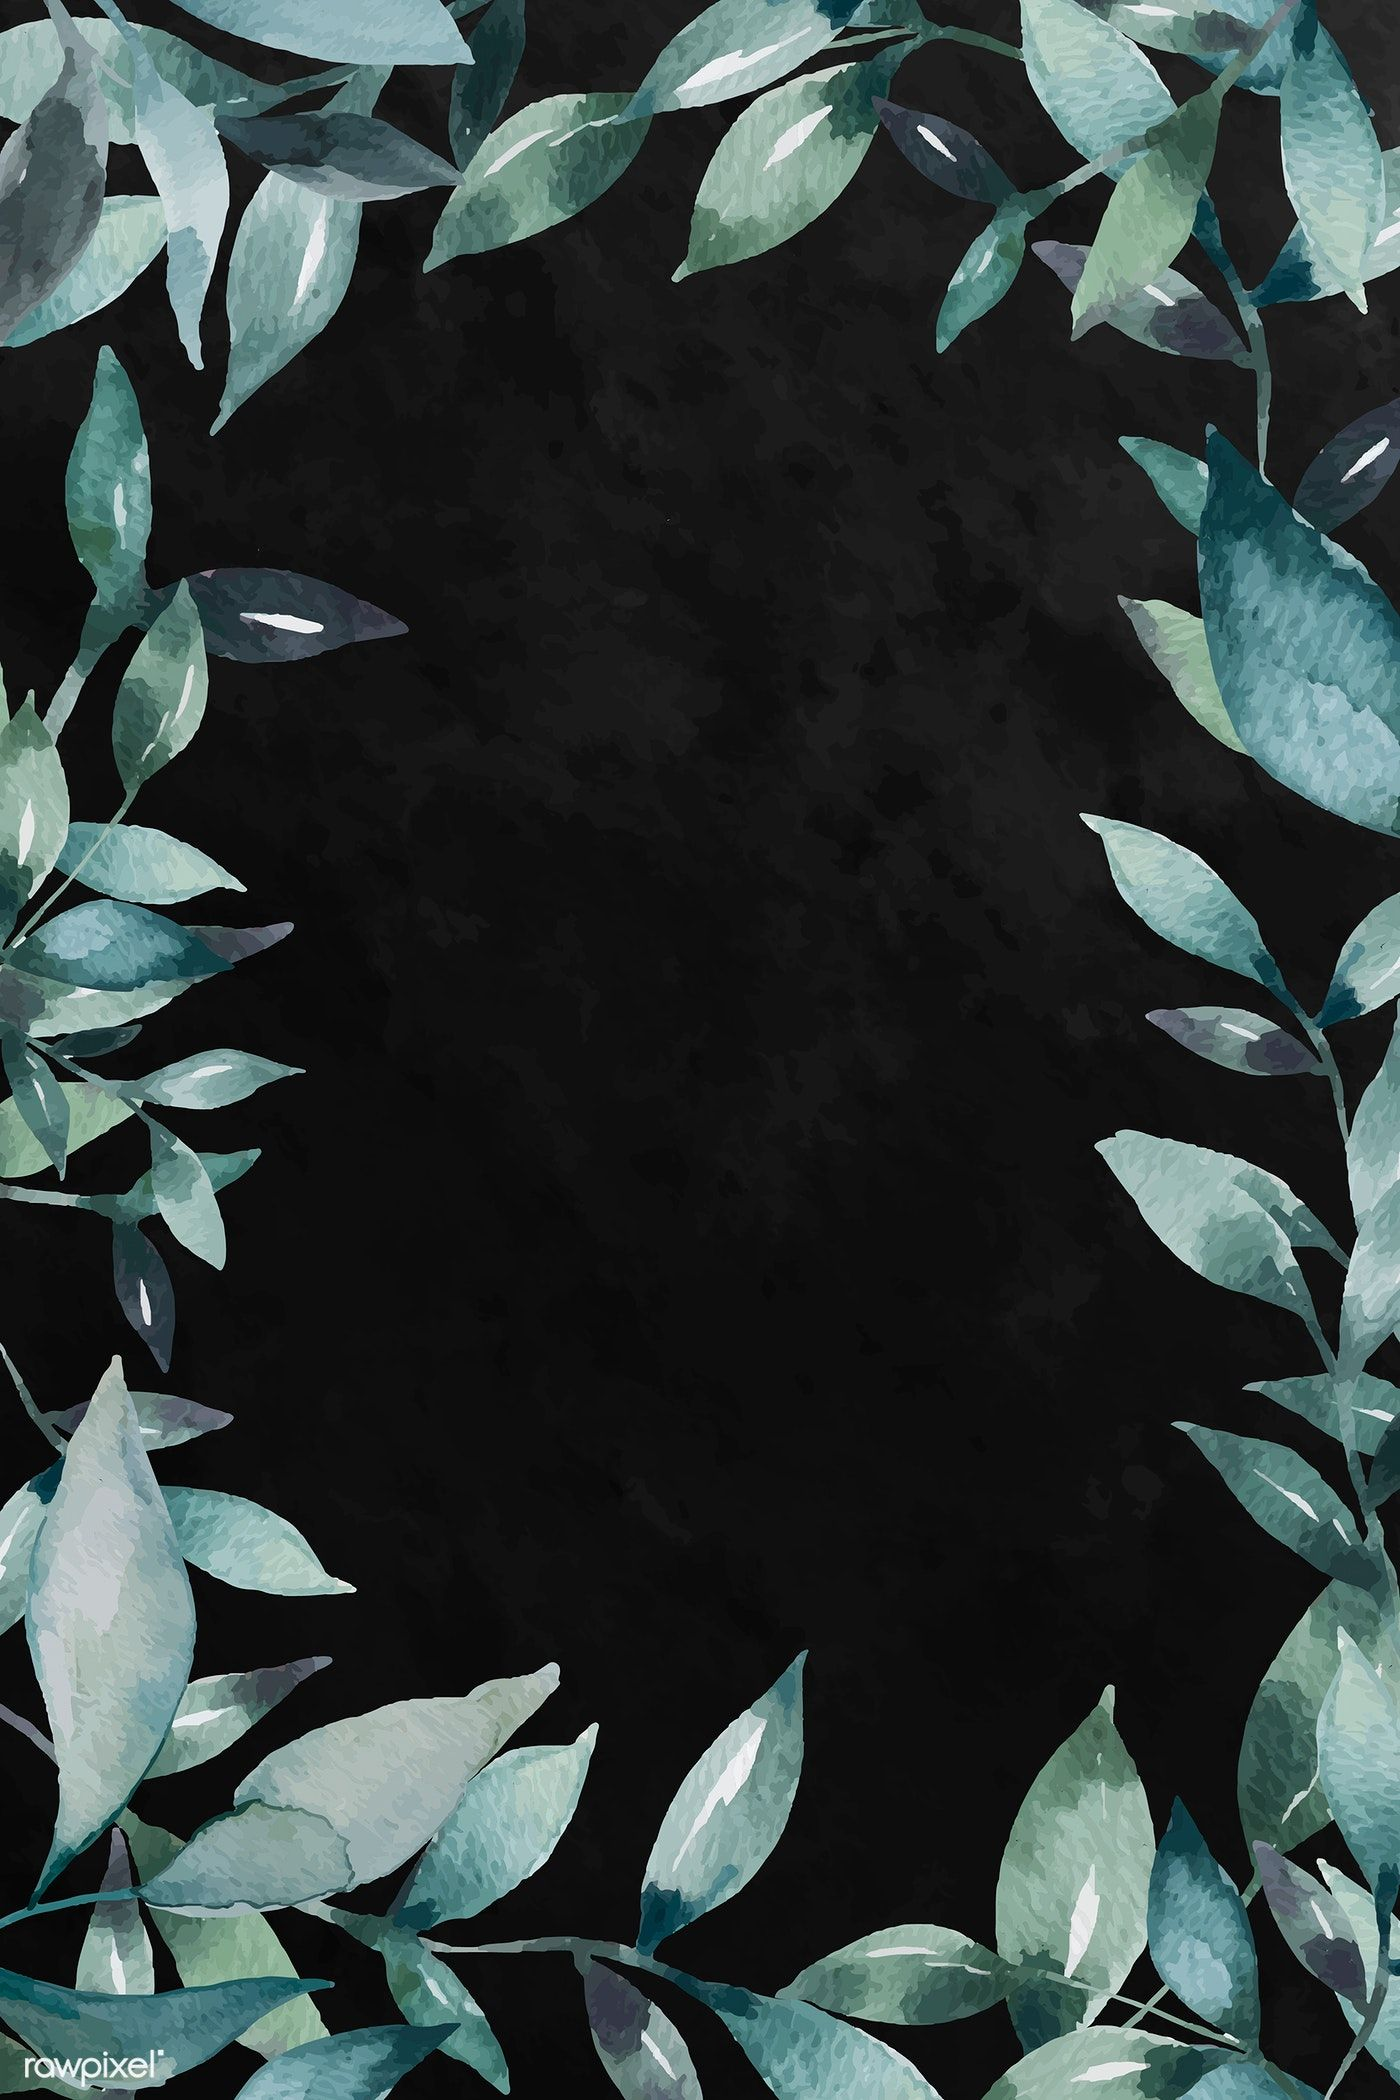 Download Premium Vector Of Green Leaf Patterned Blank Frame Vector 2037211 In 2020 Flower Background Wallpaper Flower Graphic Design Flower Graphic